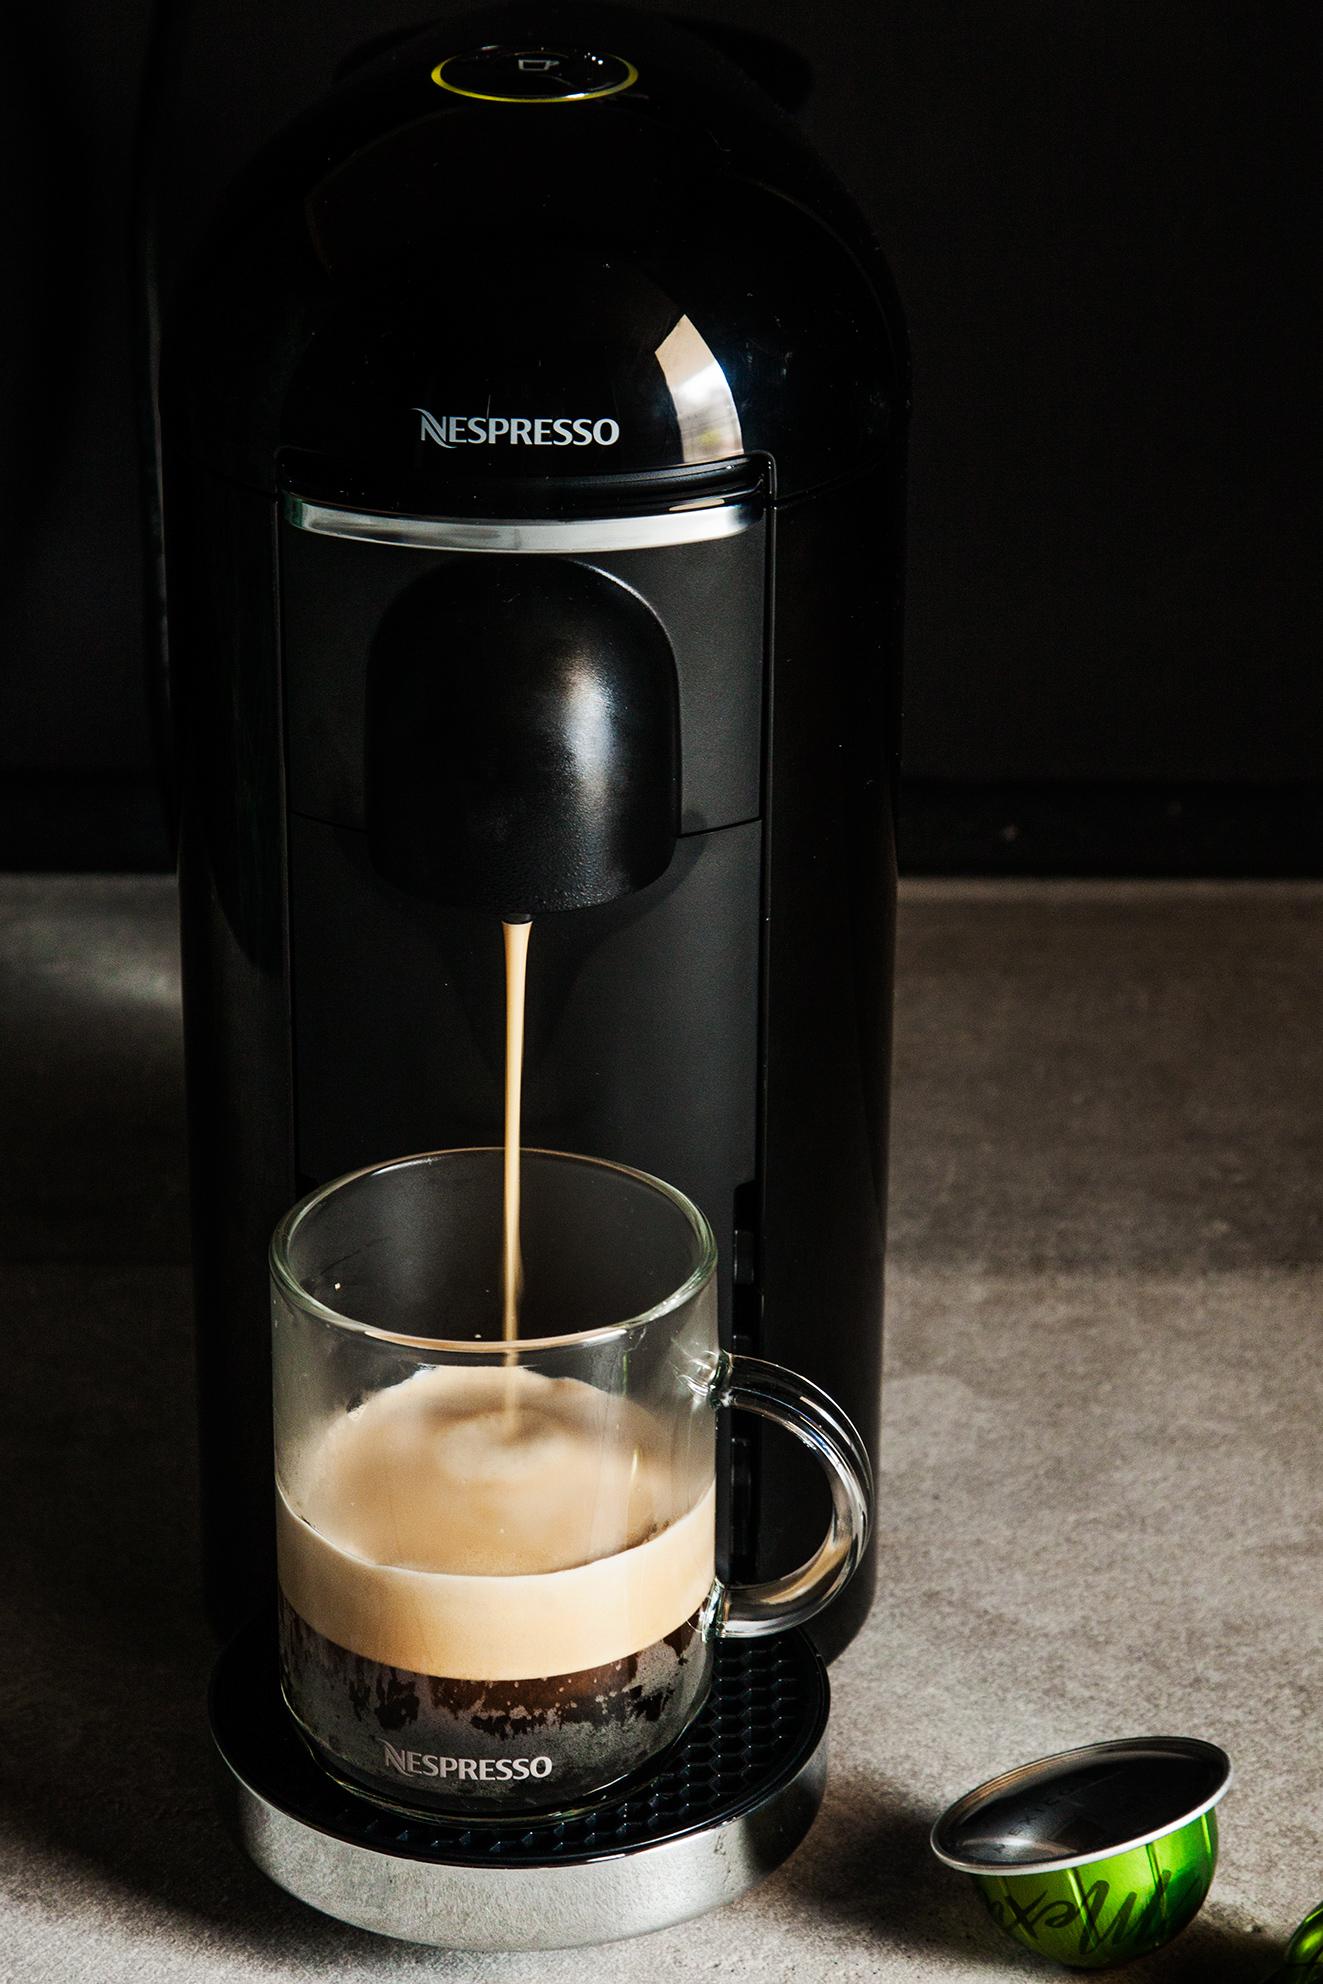 MaquinaNuevaNespresso8.jpg